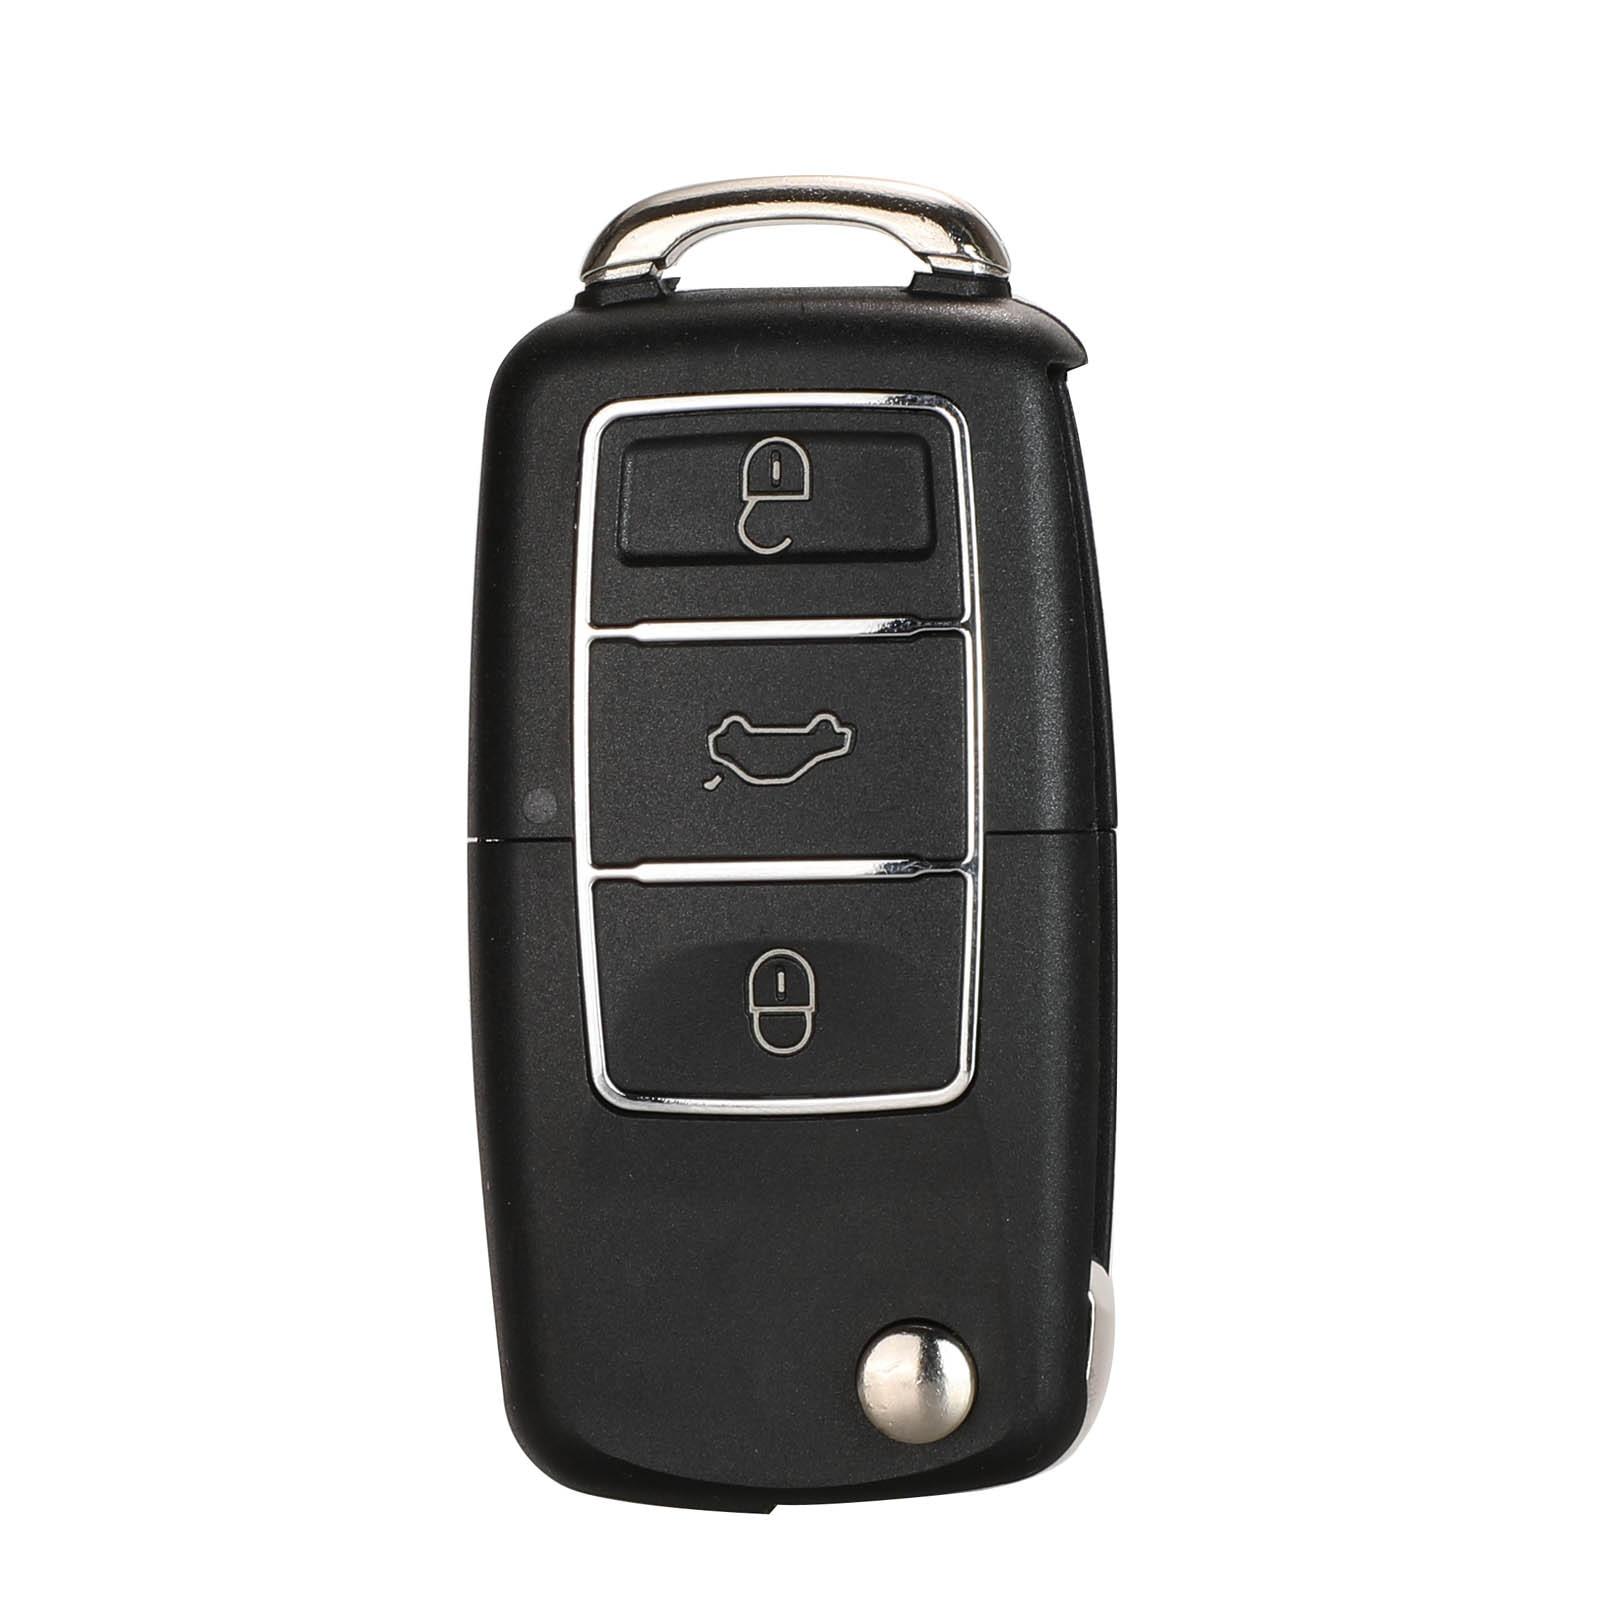 Jingyuqin Geen Batterij Houder Flip Auto Sleutel Shell Voor Vw Jetta Golf Passat B5 B6 Kever Polo Bora Caddy MK5 skoda 3BTN Afstandsbediening Geval